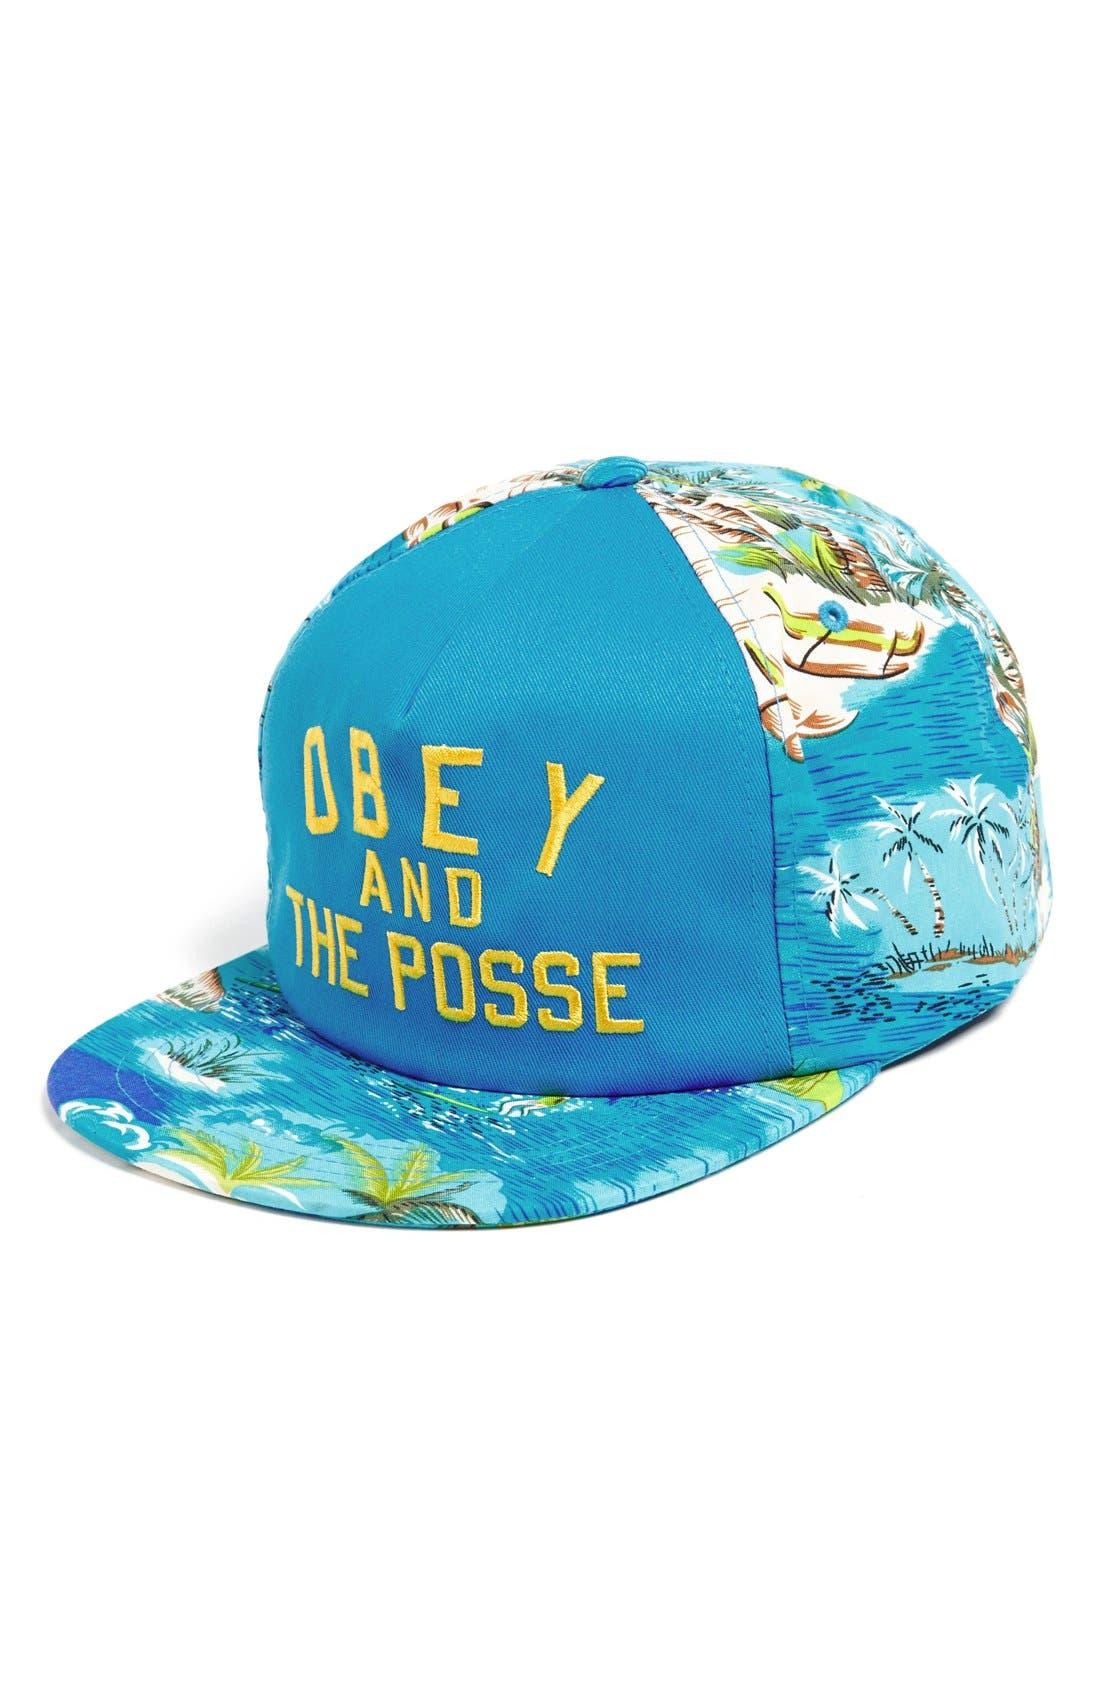 Main Image - Obey 'Adventure' Snapback Cap